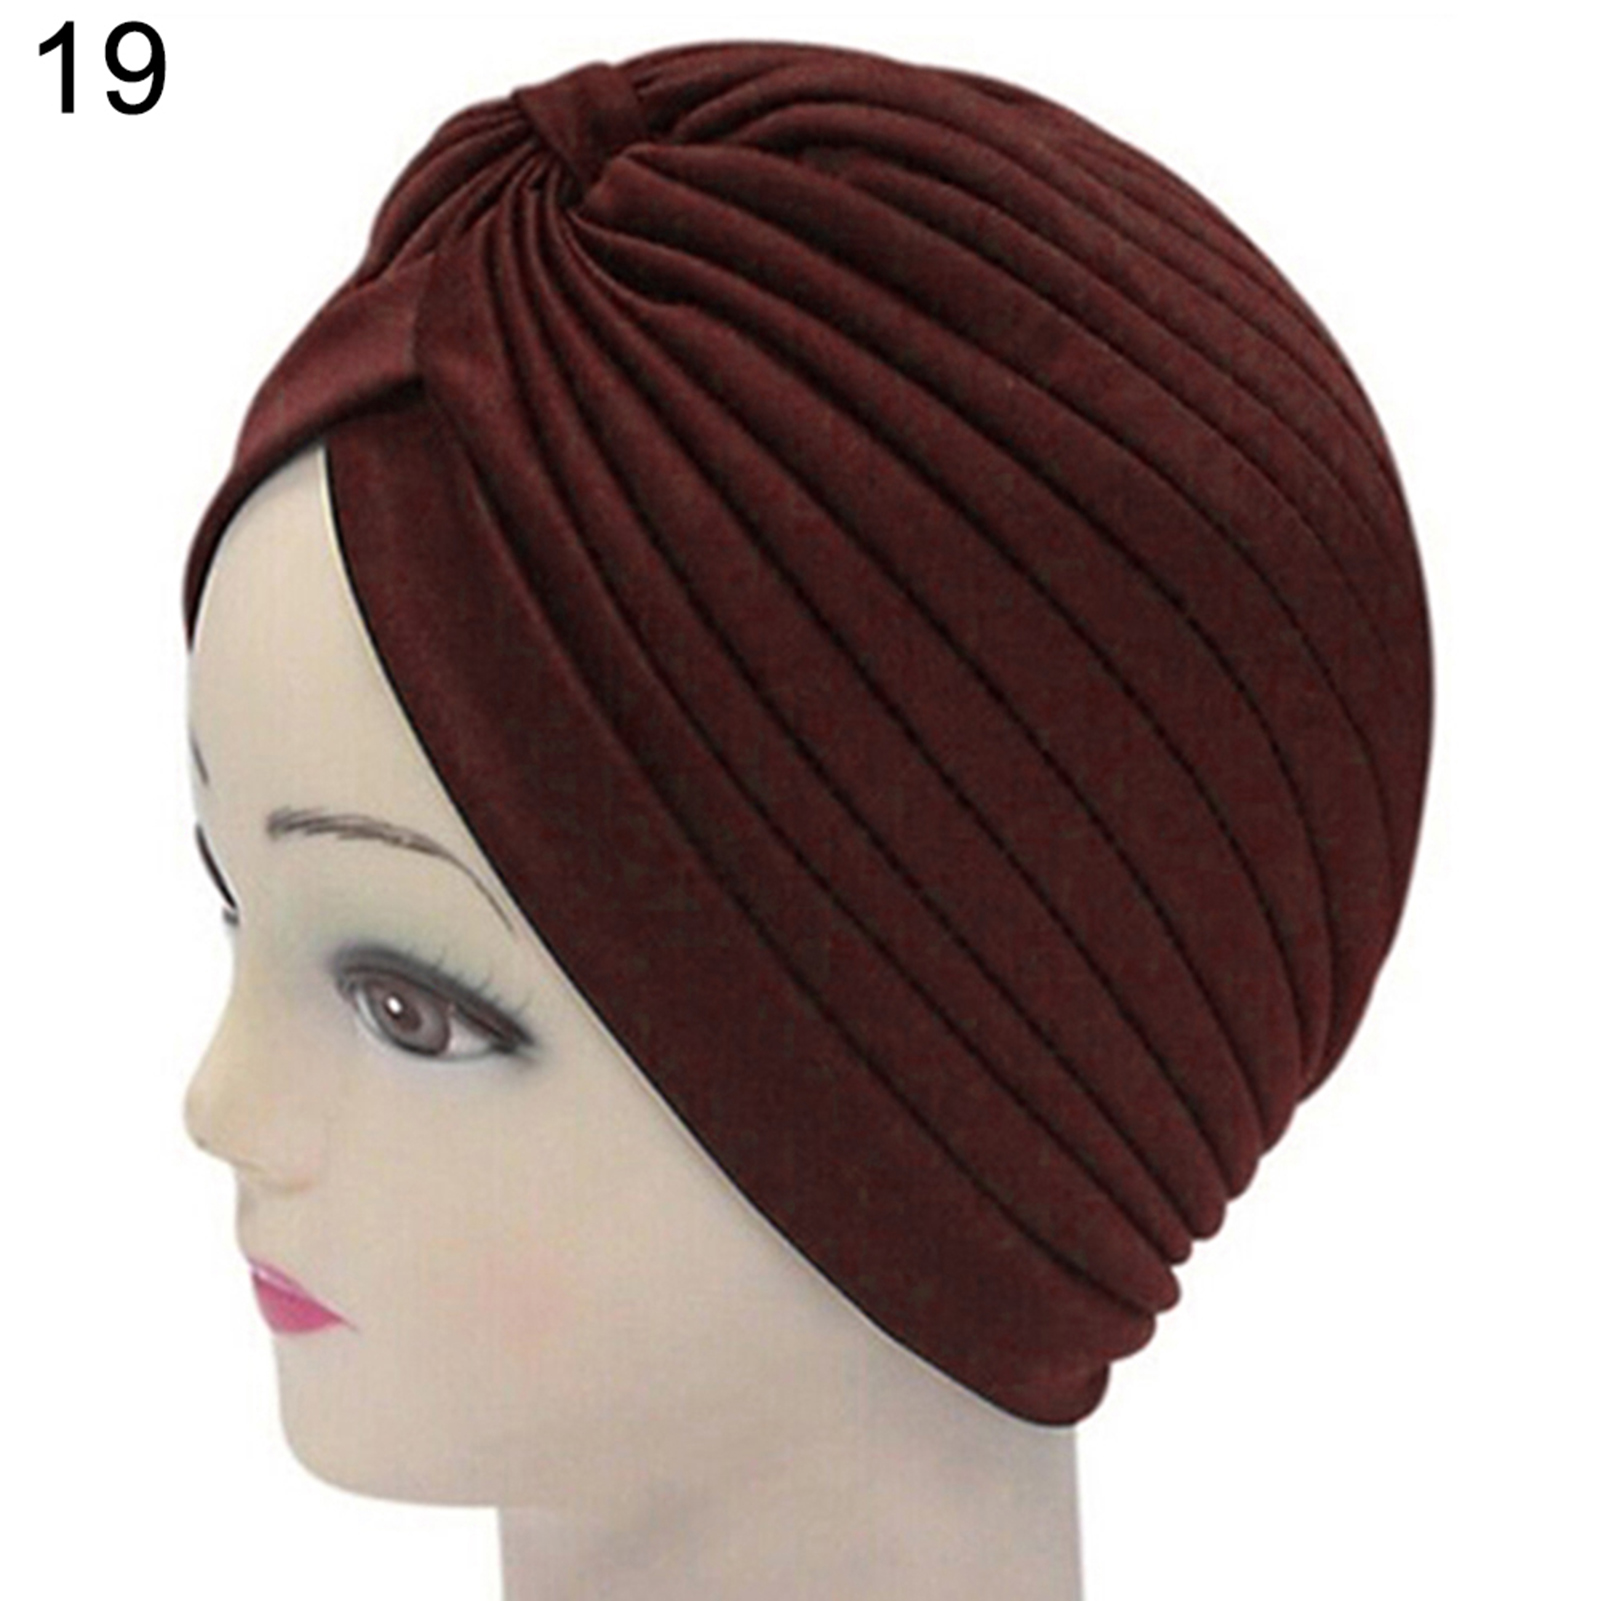 Turban-Hat-Cap-Hijab-Hairband-Bandana-Wrap-Hair-Loss-Chemo-Fancy-Indian-Plain-Ne thumbnail 28